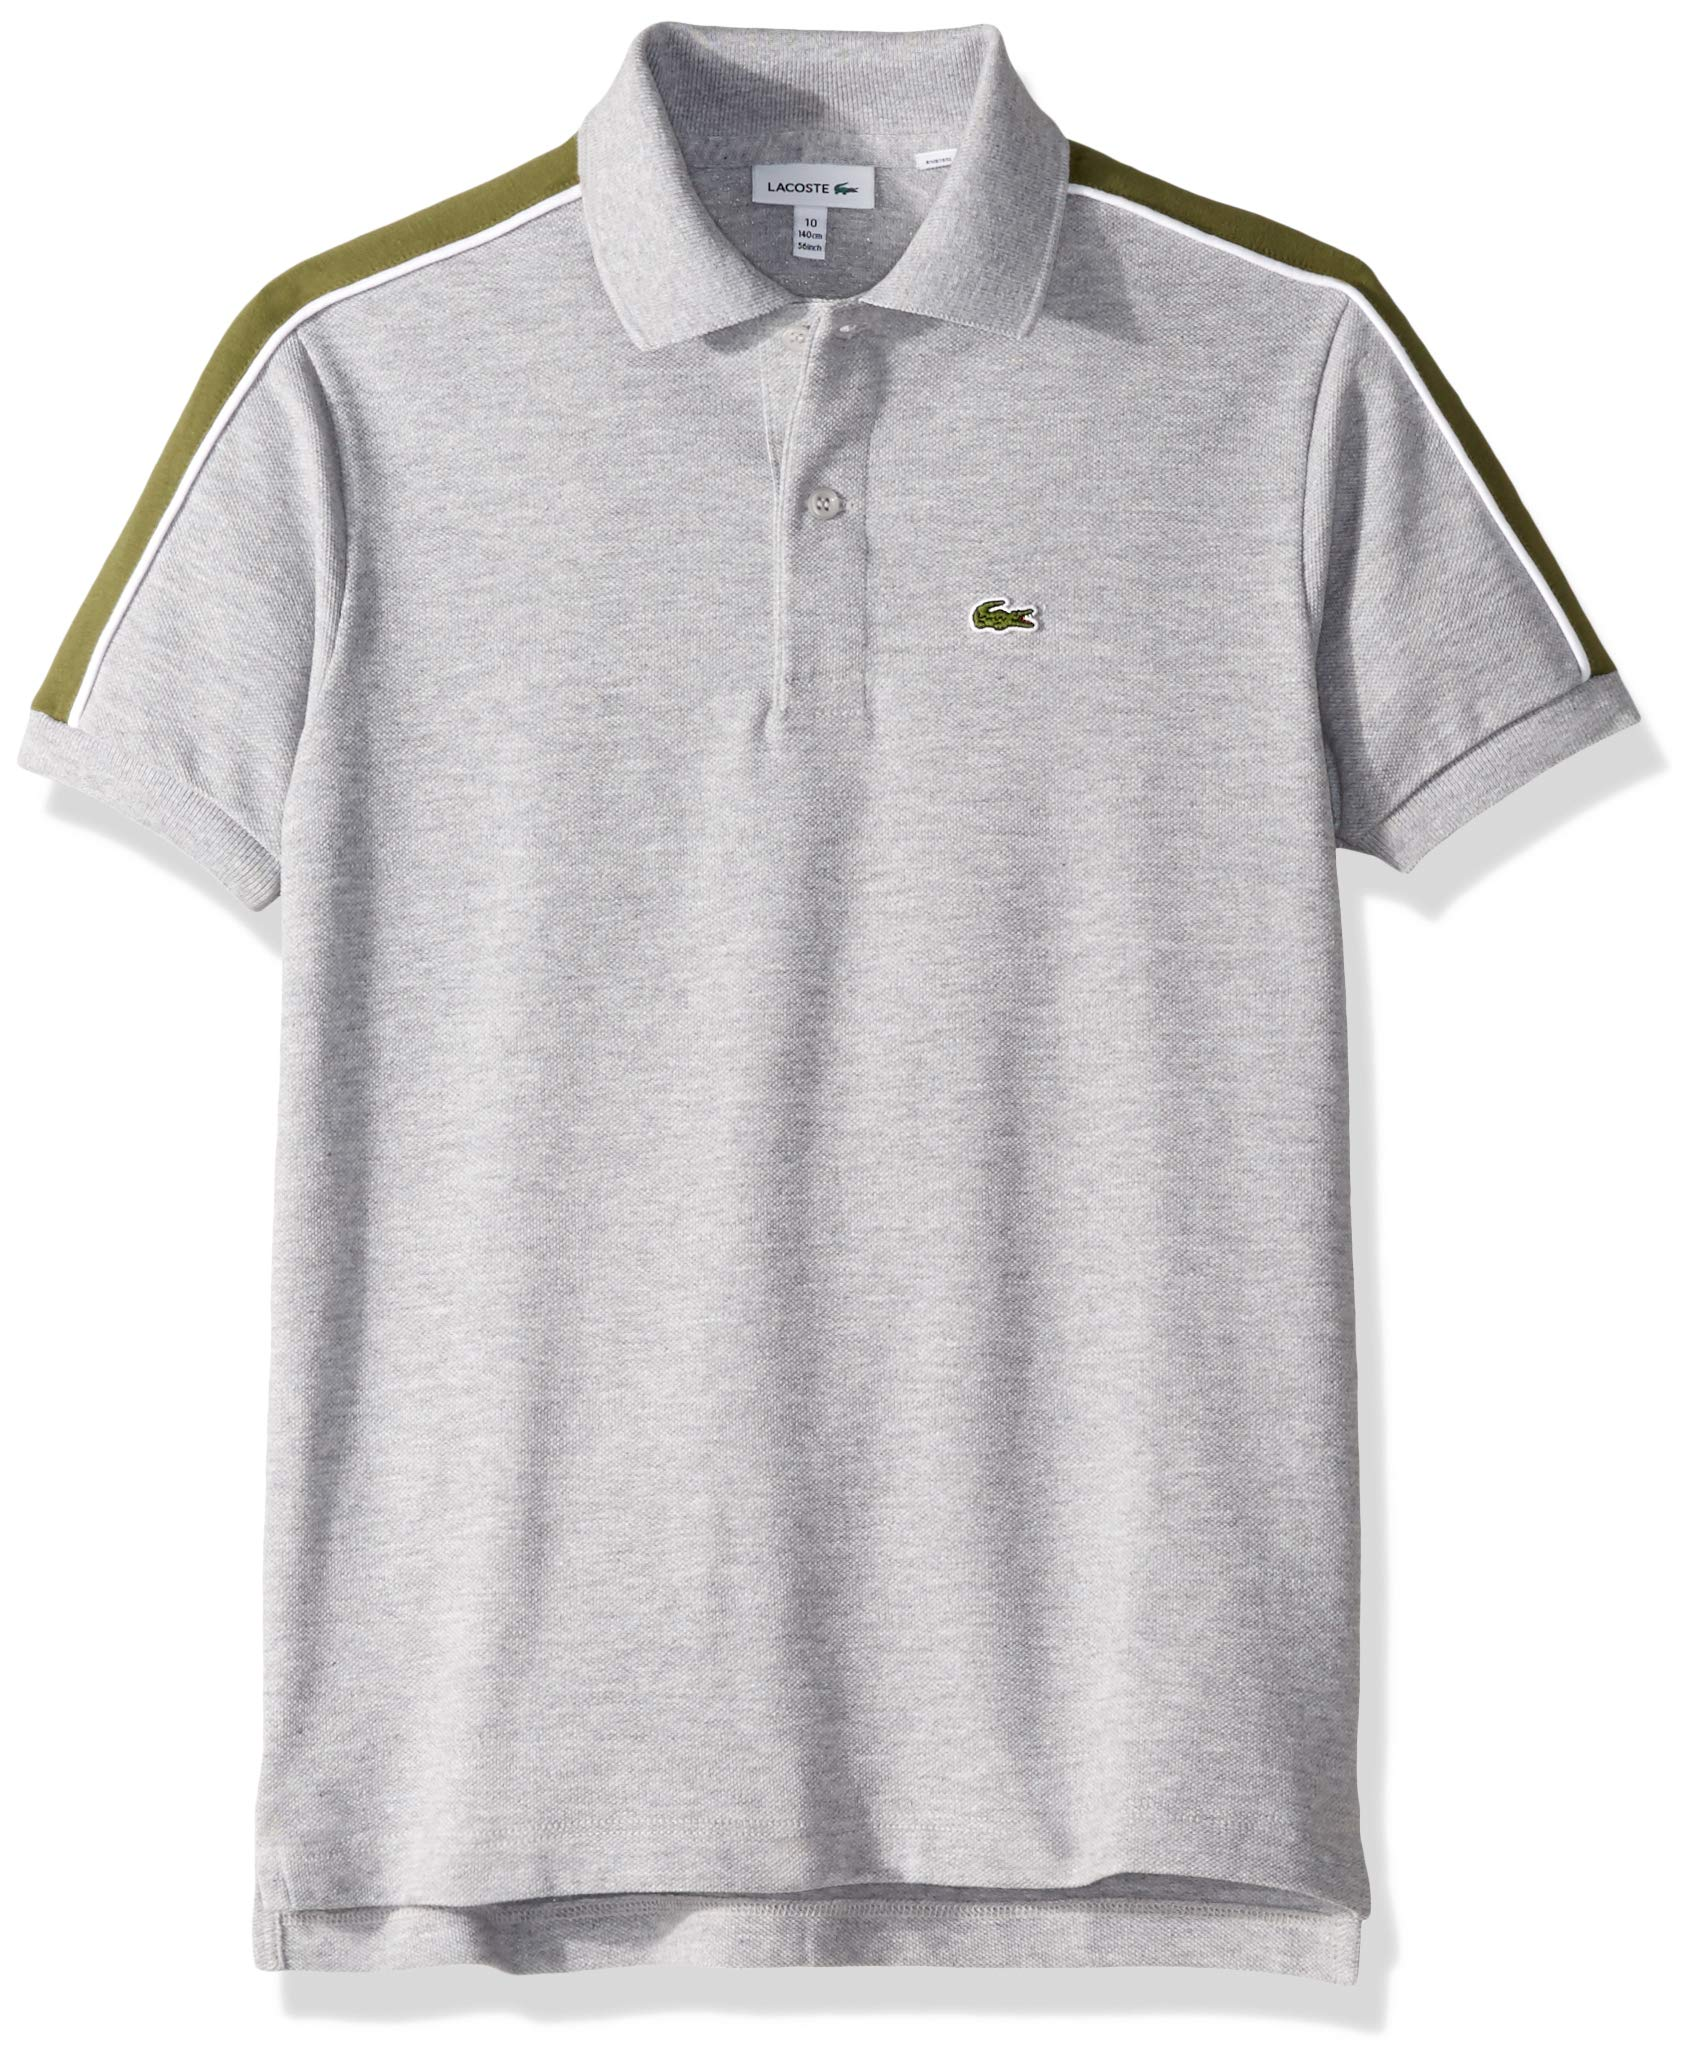 Lacoste Big BOY Athleisure Shoulder Striped Pique Polo, Silver Chine/Marsh, 8YR